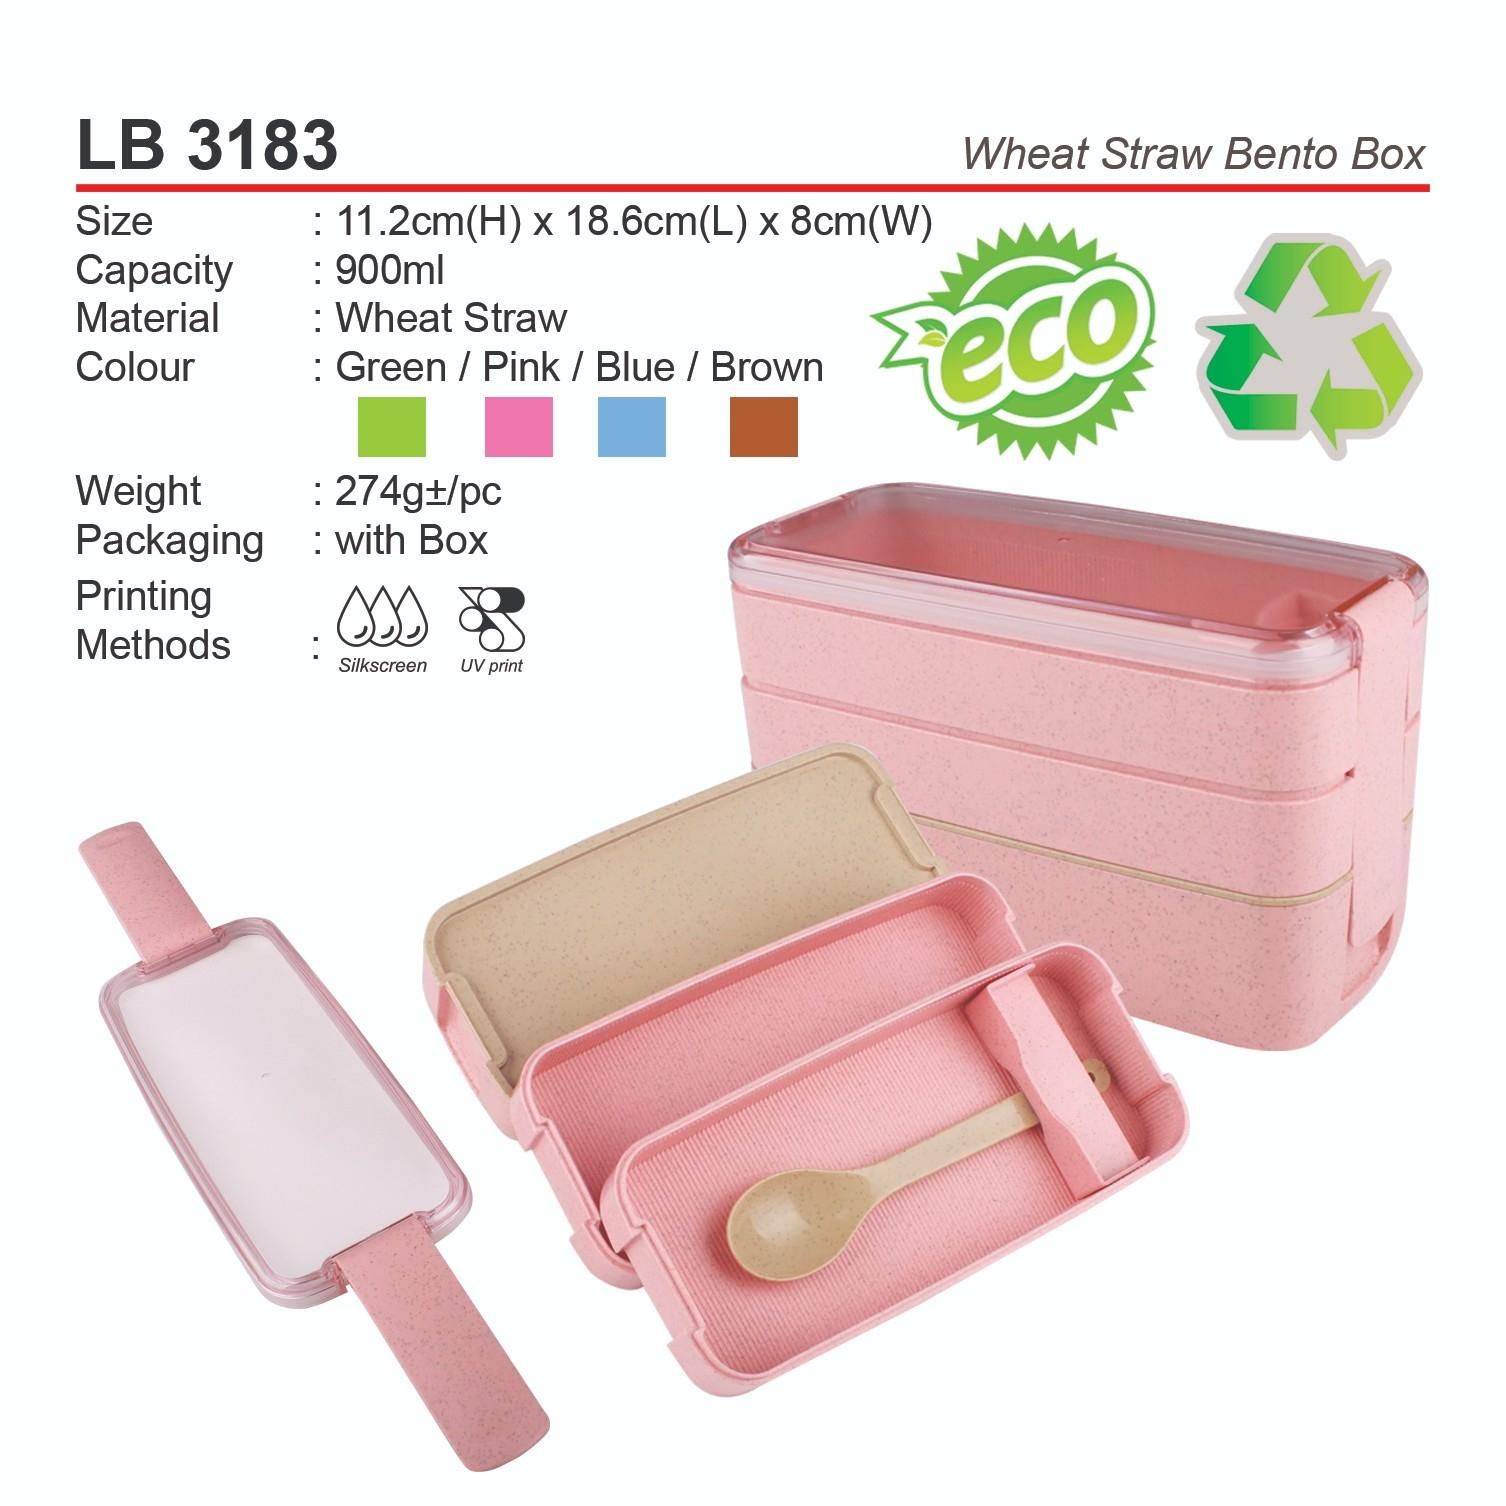 LB 3183 Wheat Straw Bento Box